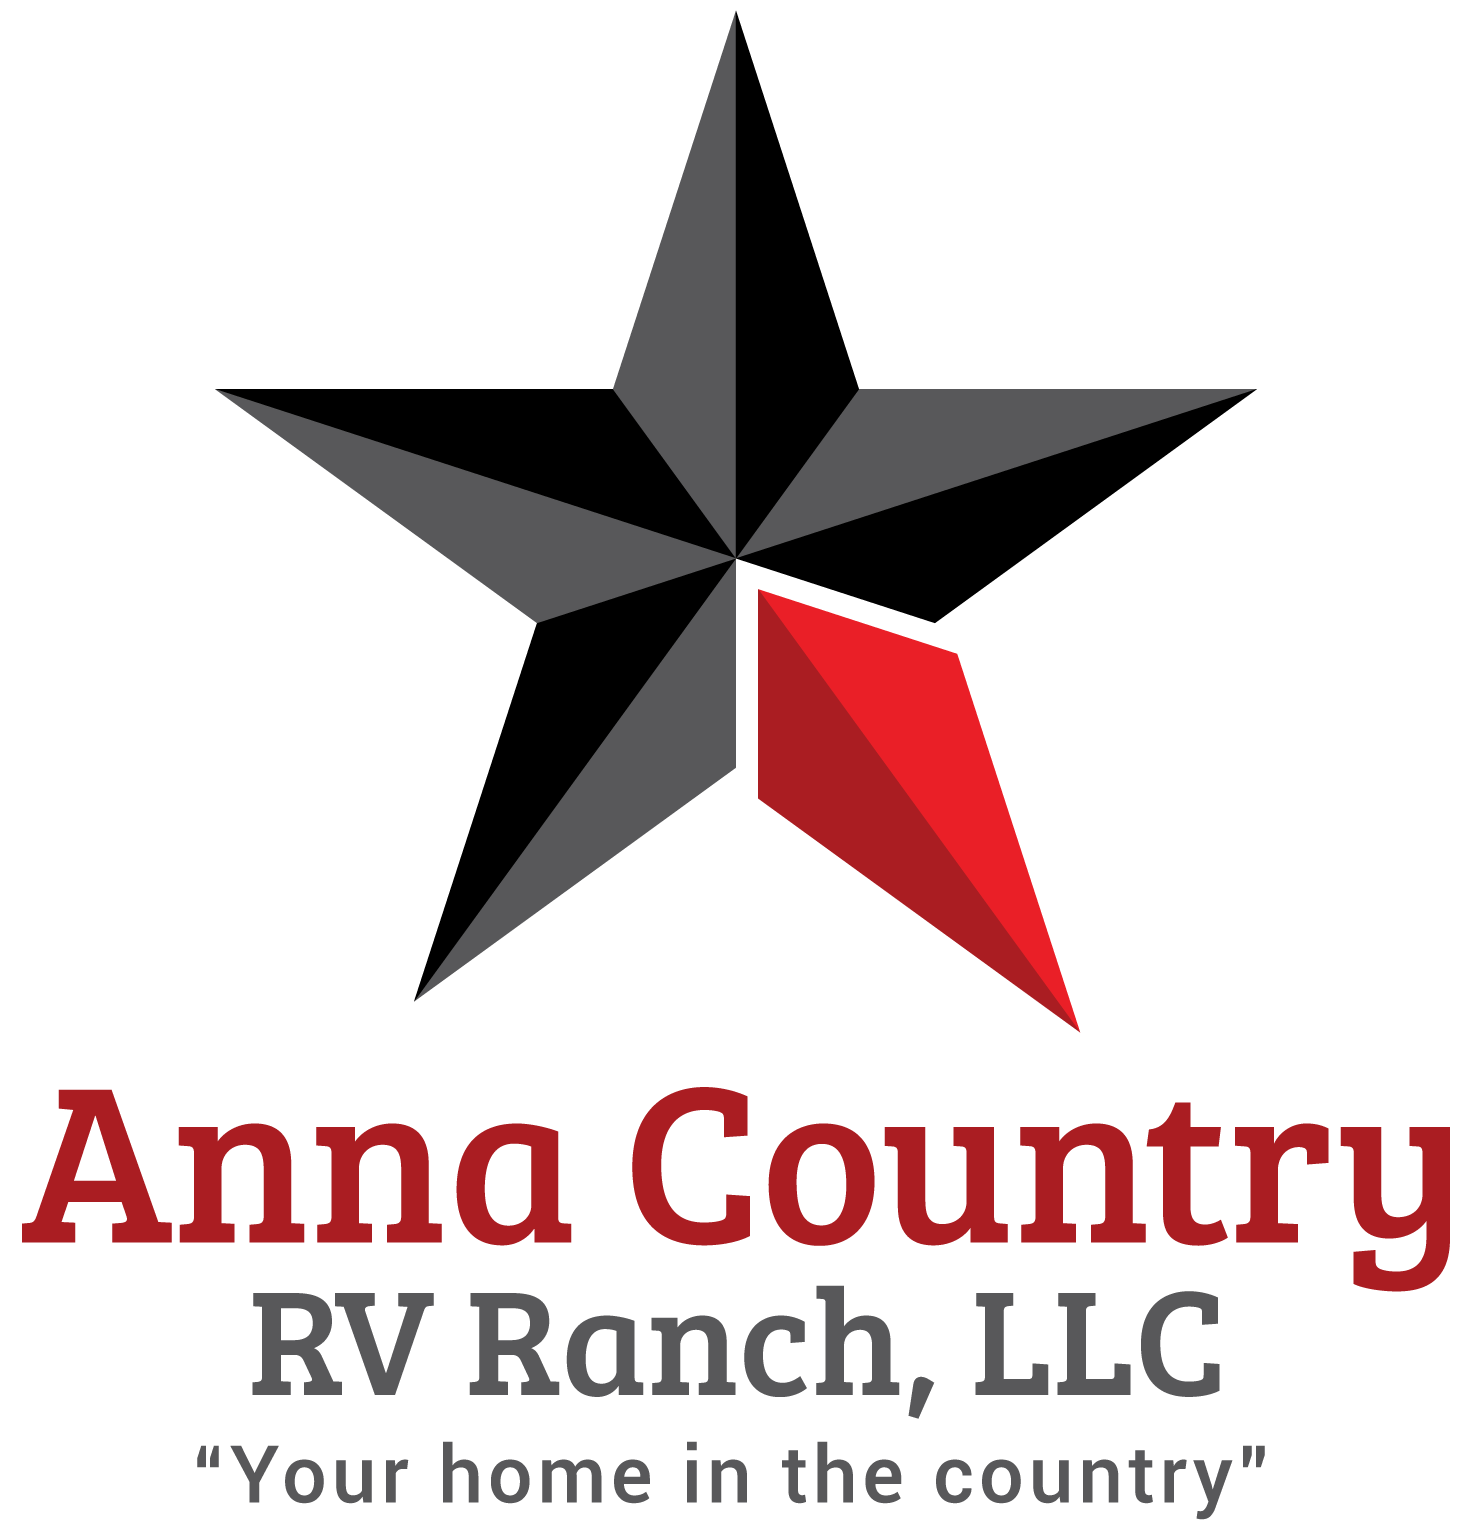 Anna Country RV Ranch